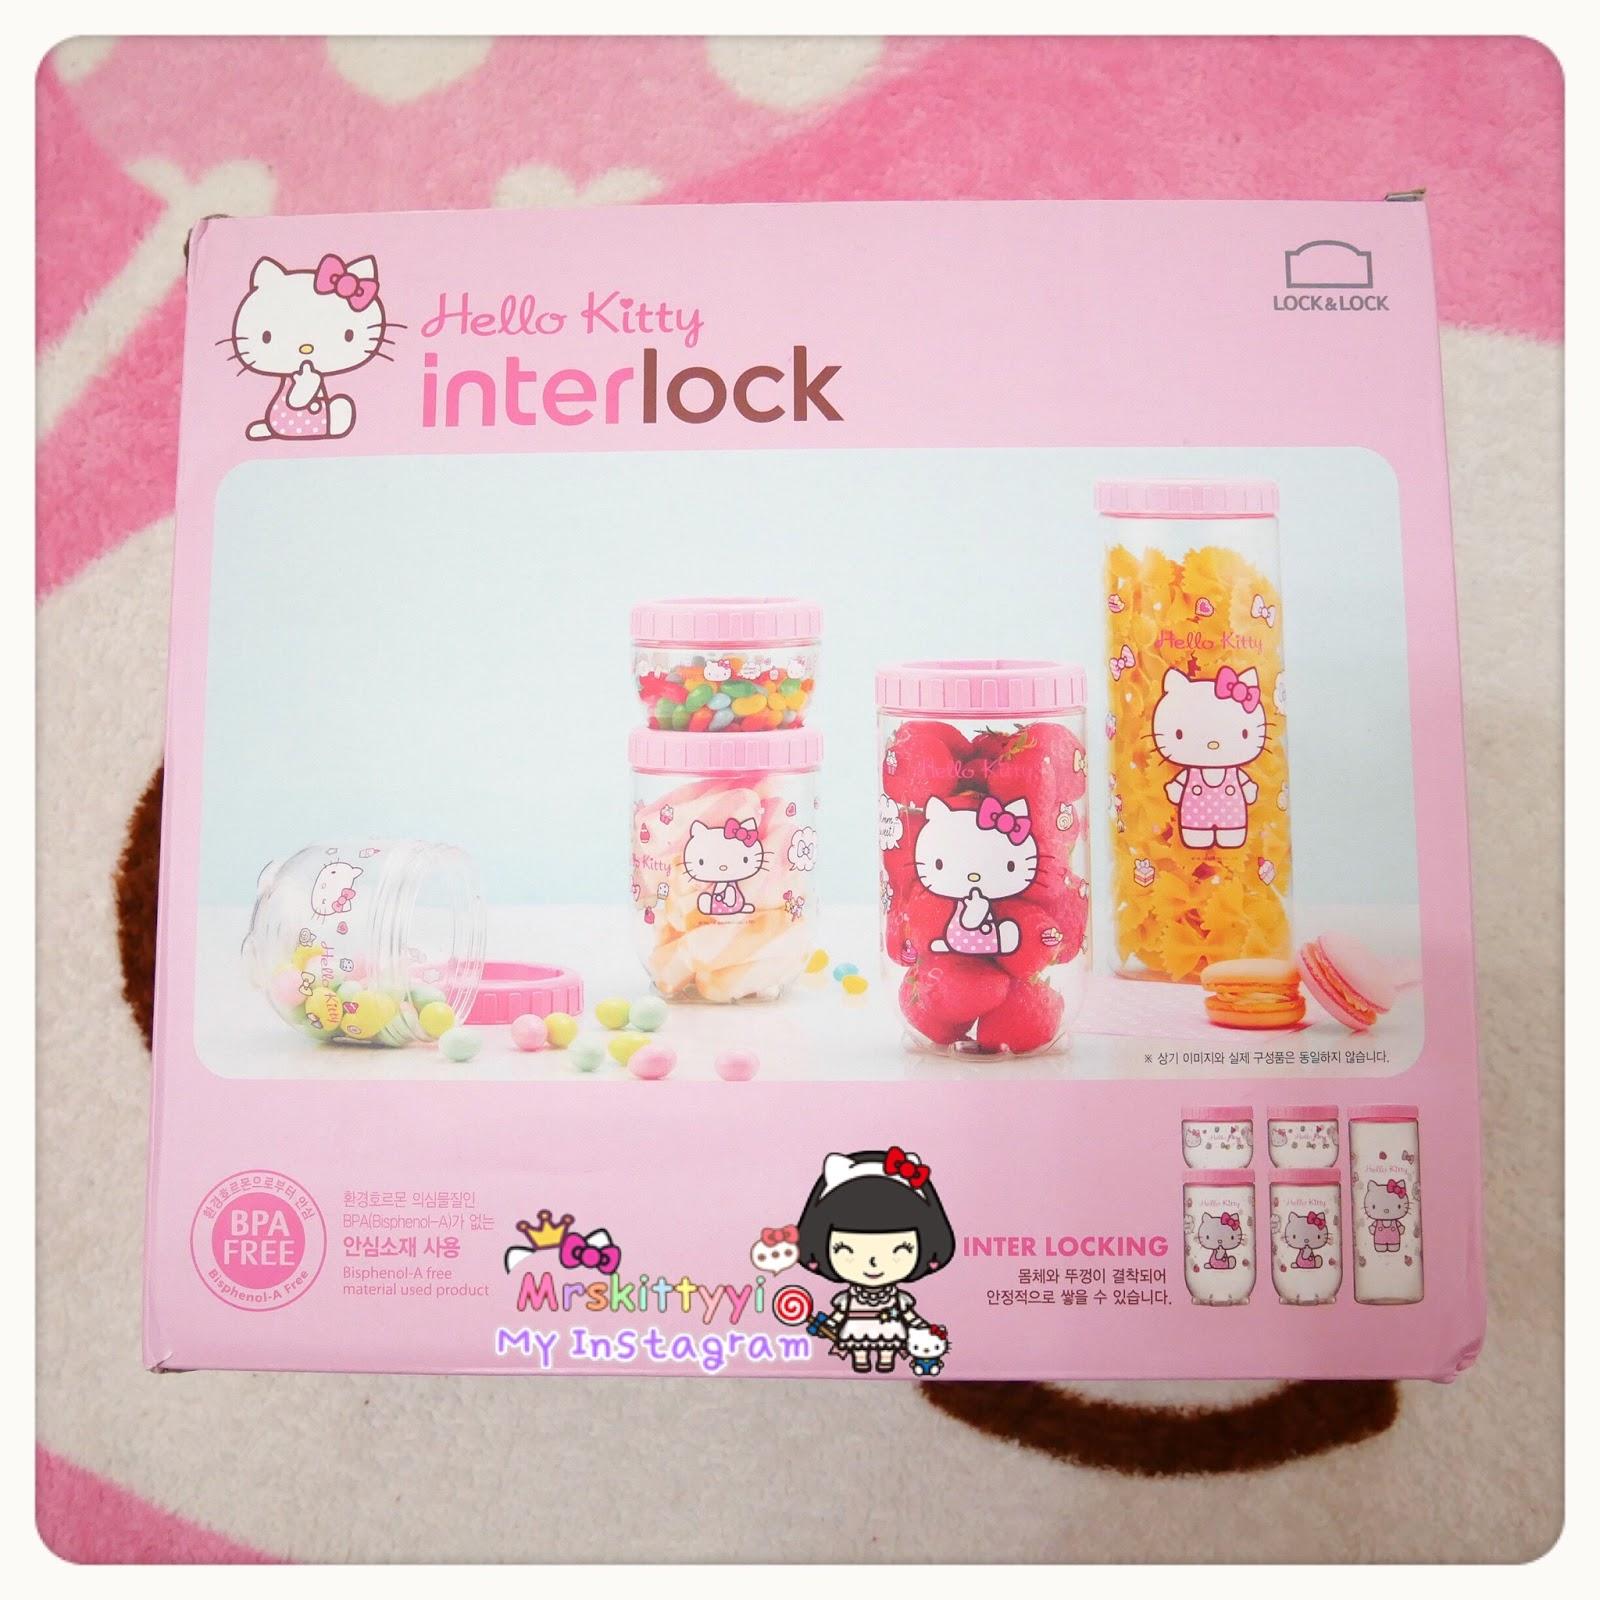 Mrskitty Yi ♥: Hello Kitty Cute Kitchen Stuff